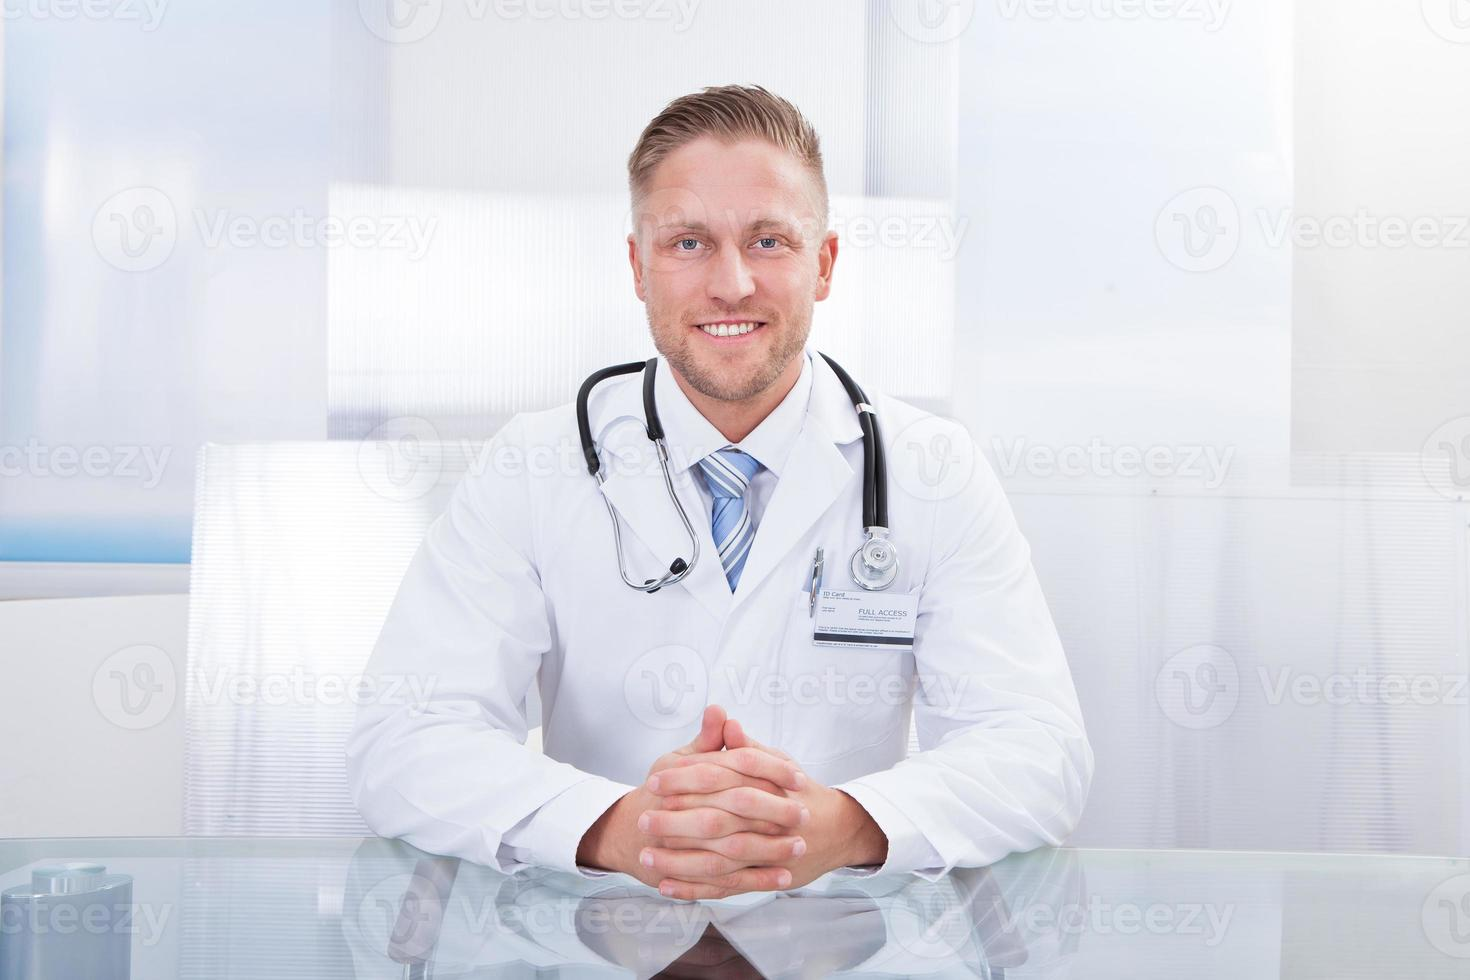 glimlachende arts of adviseur zittend aan een bureau foto